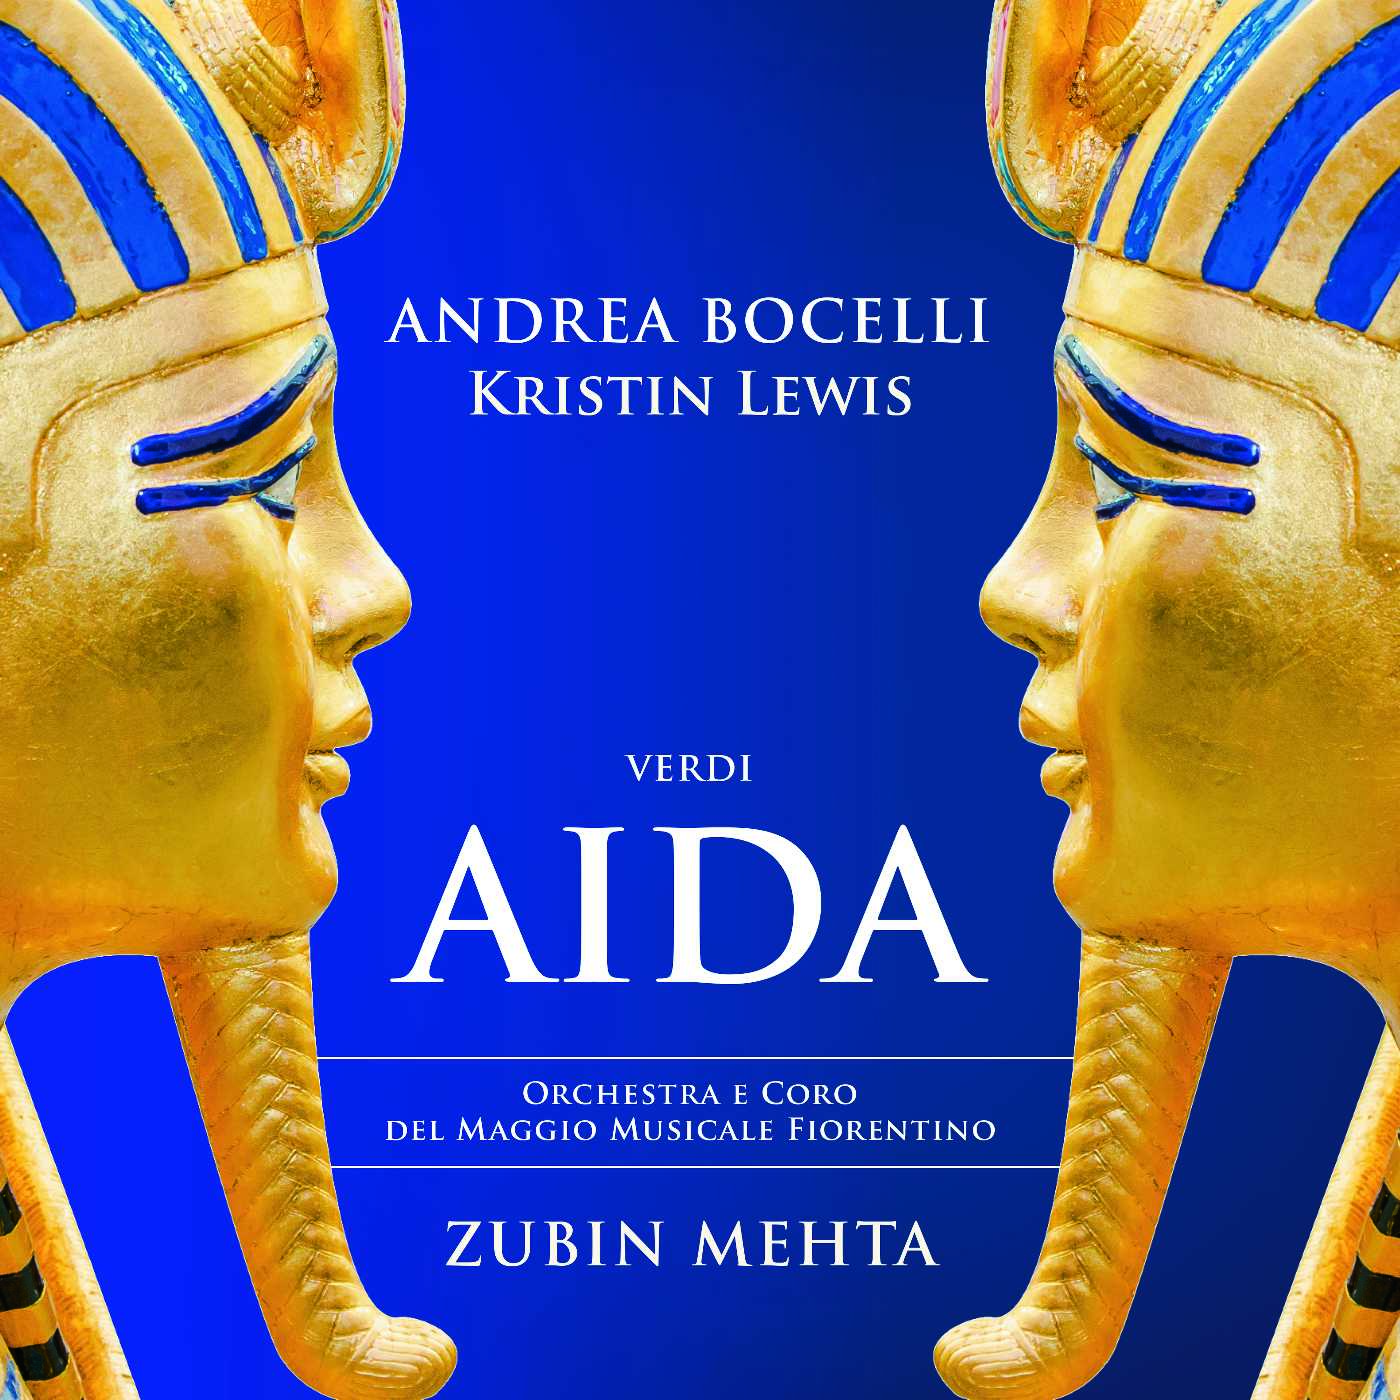 IN REVIEW: Giuseppe Verdi - AIDA (DECCA 483 0075)